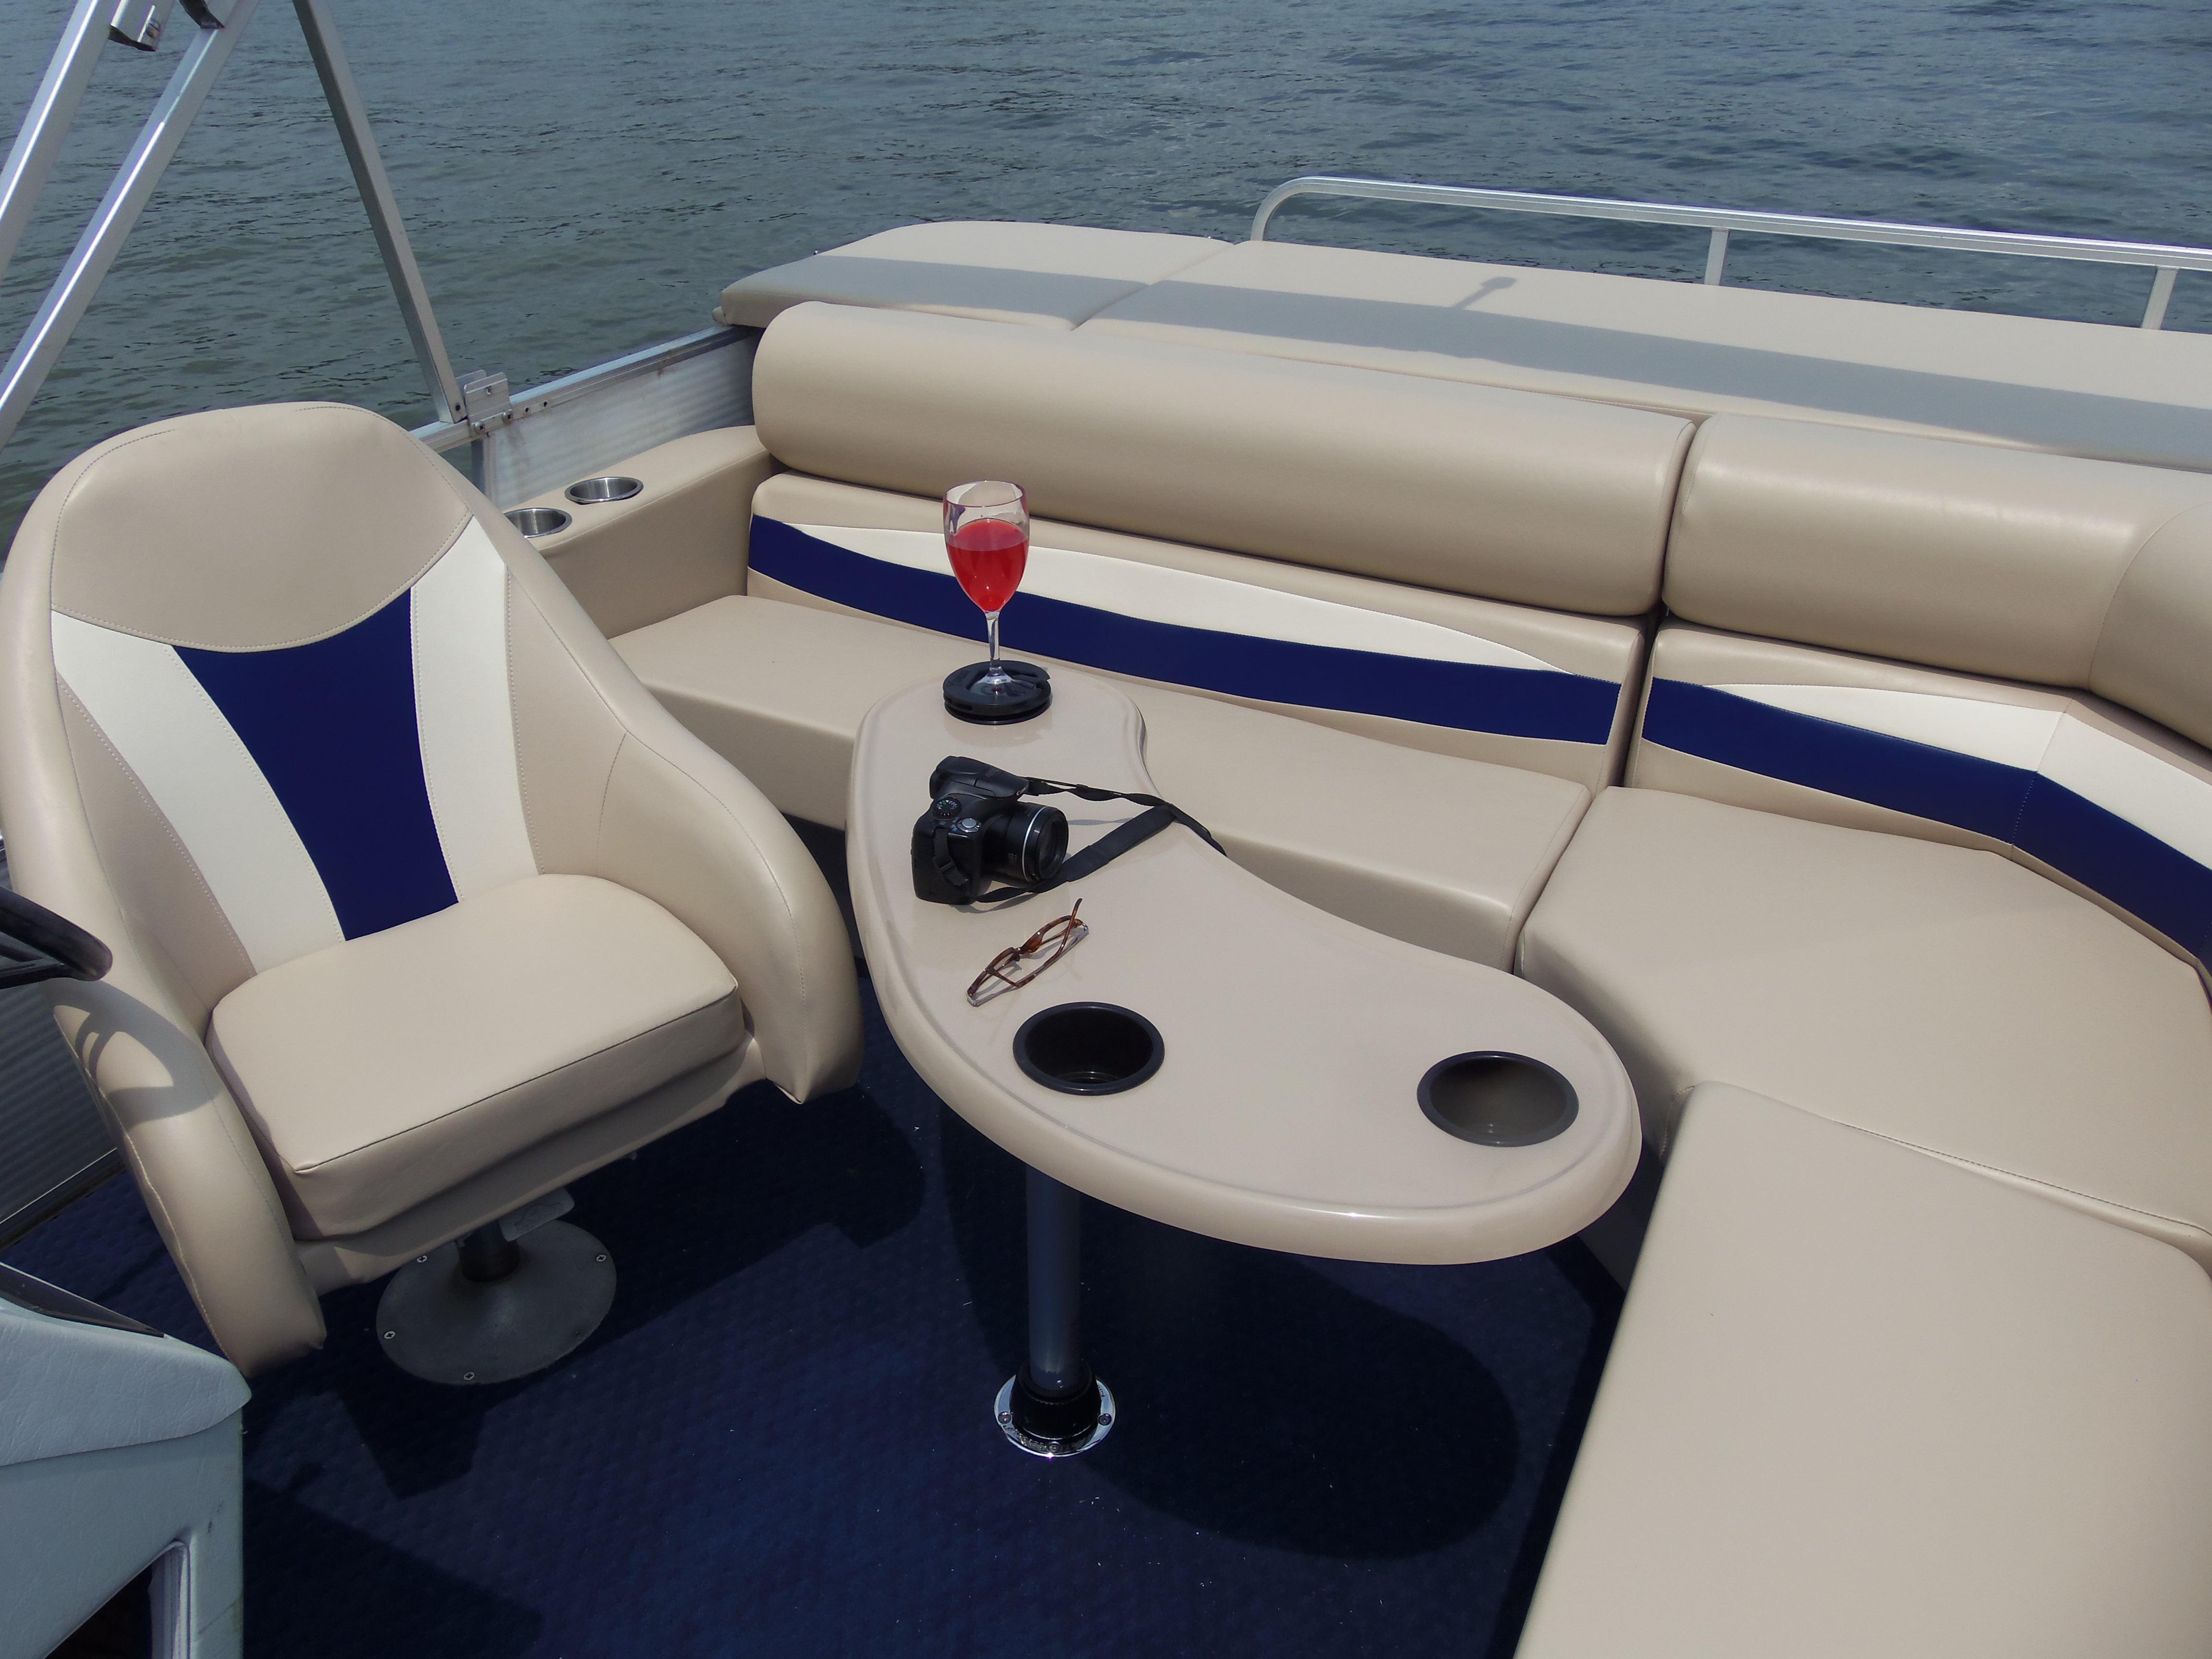 Tan Kidney Fiberglass Boat Table w/Black cupholders